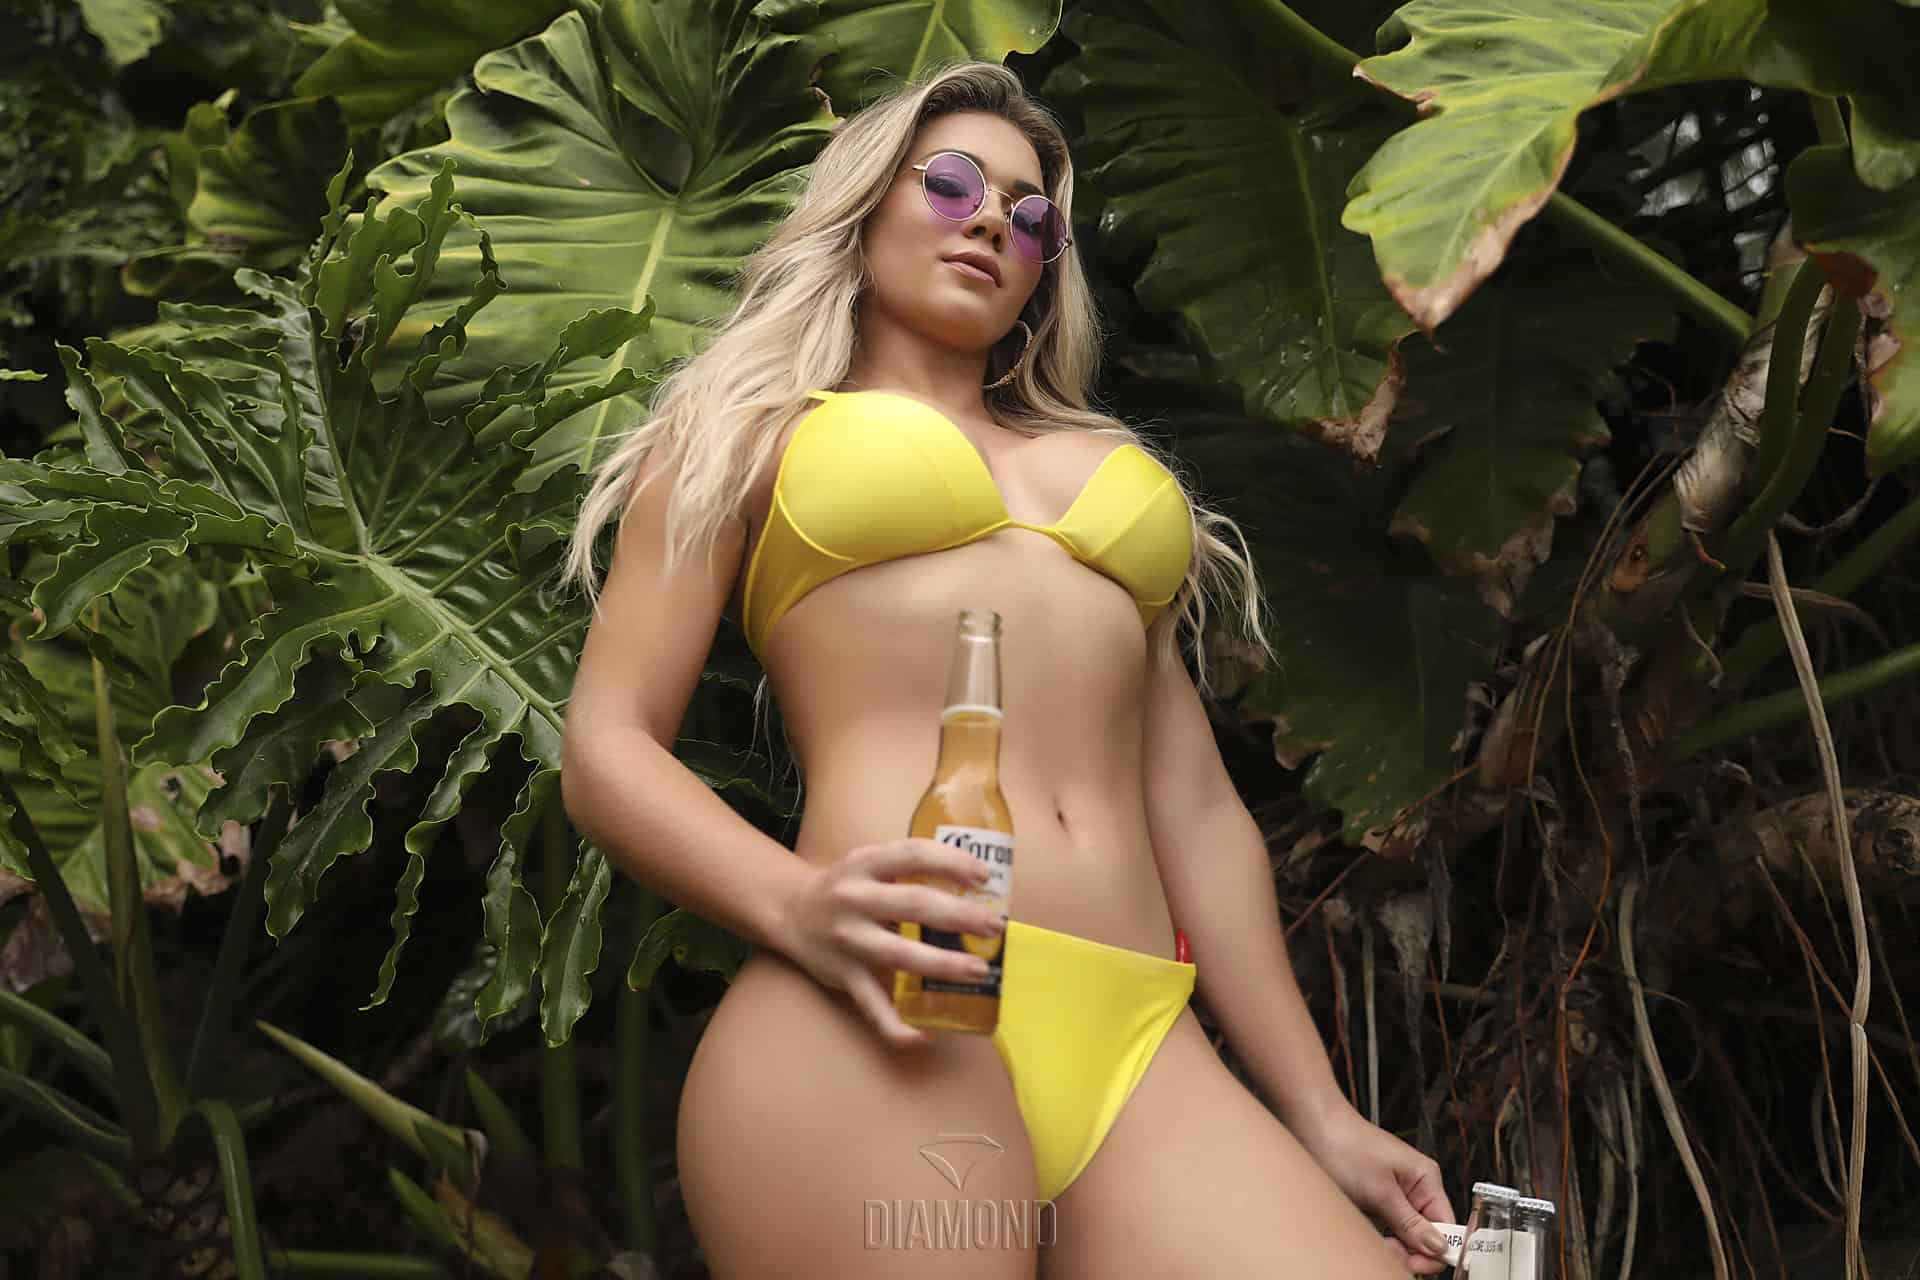 #VIDEO Flaviane Alves se desnuda por primera vez